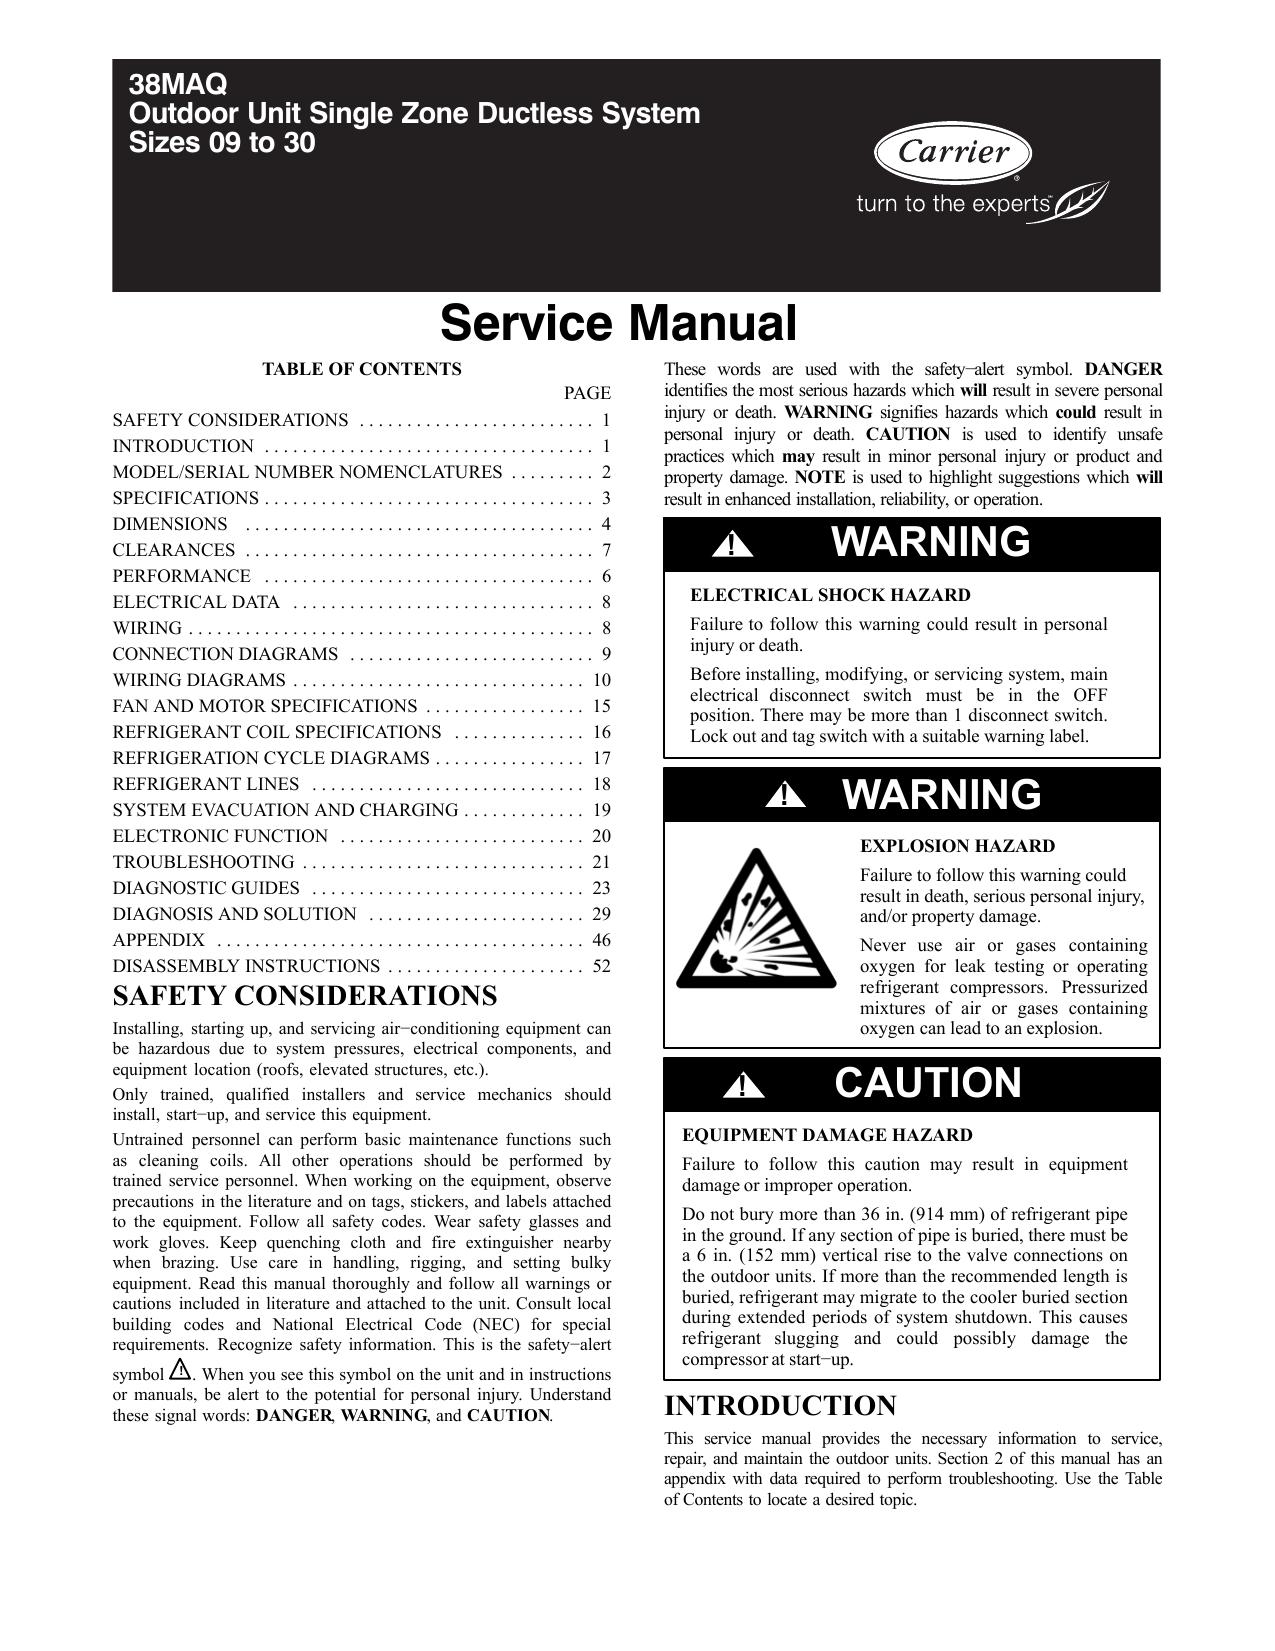 rdi refrigeration unit wiring diagrams service manual manualzz  service manual manualzz